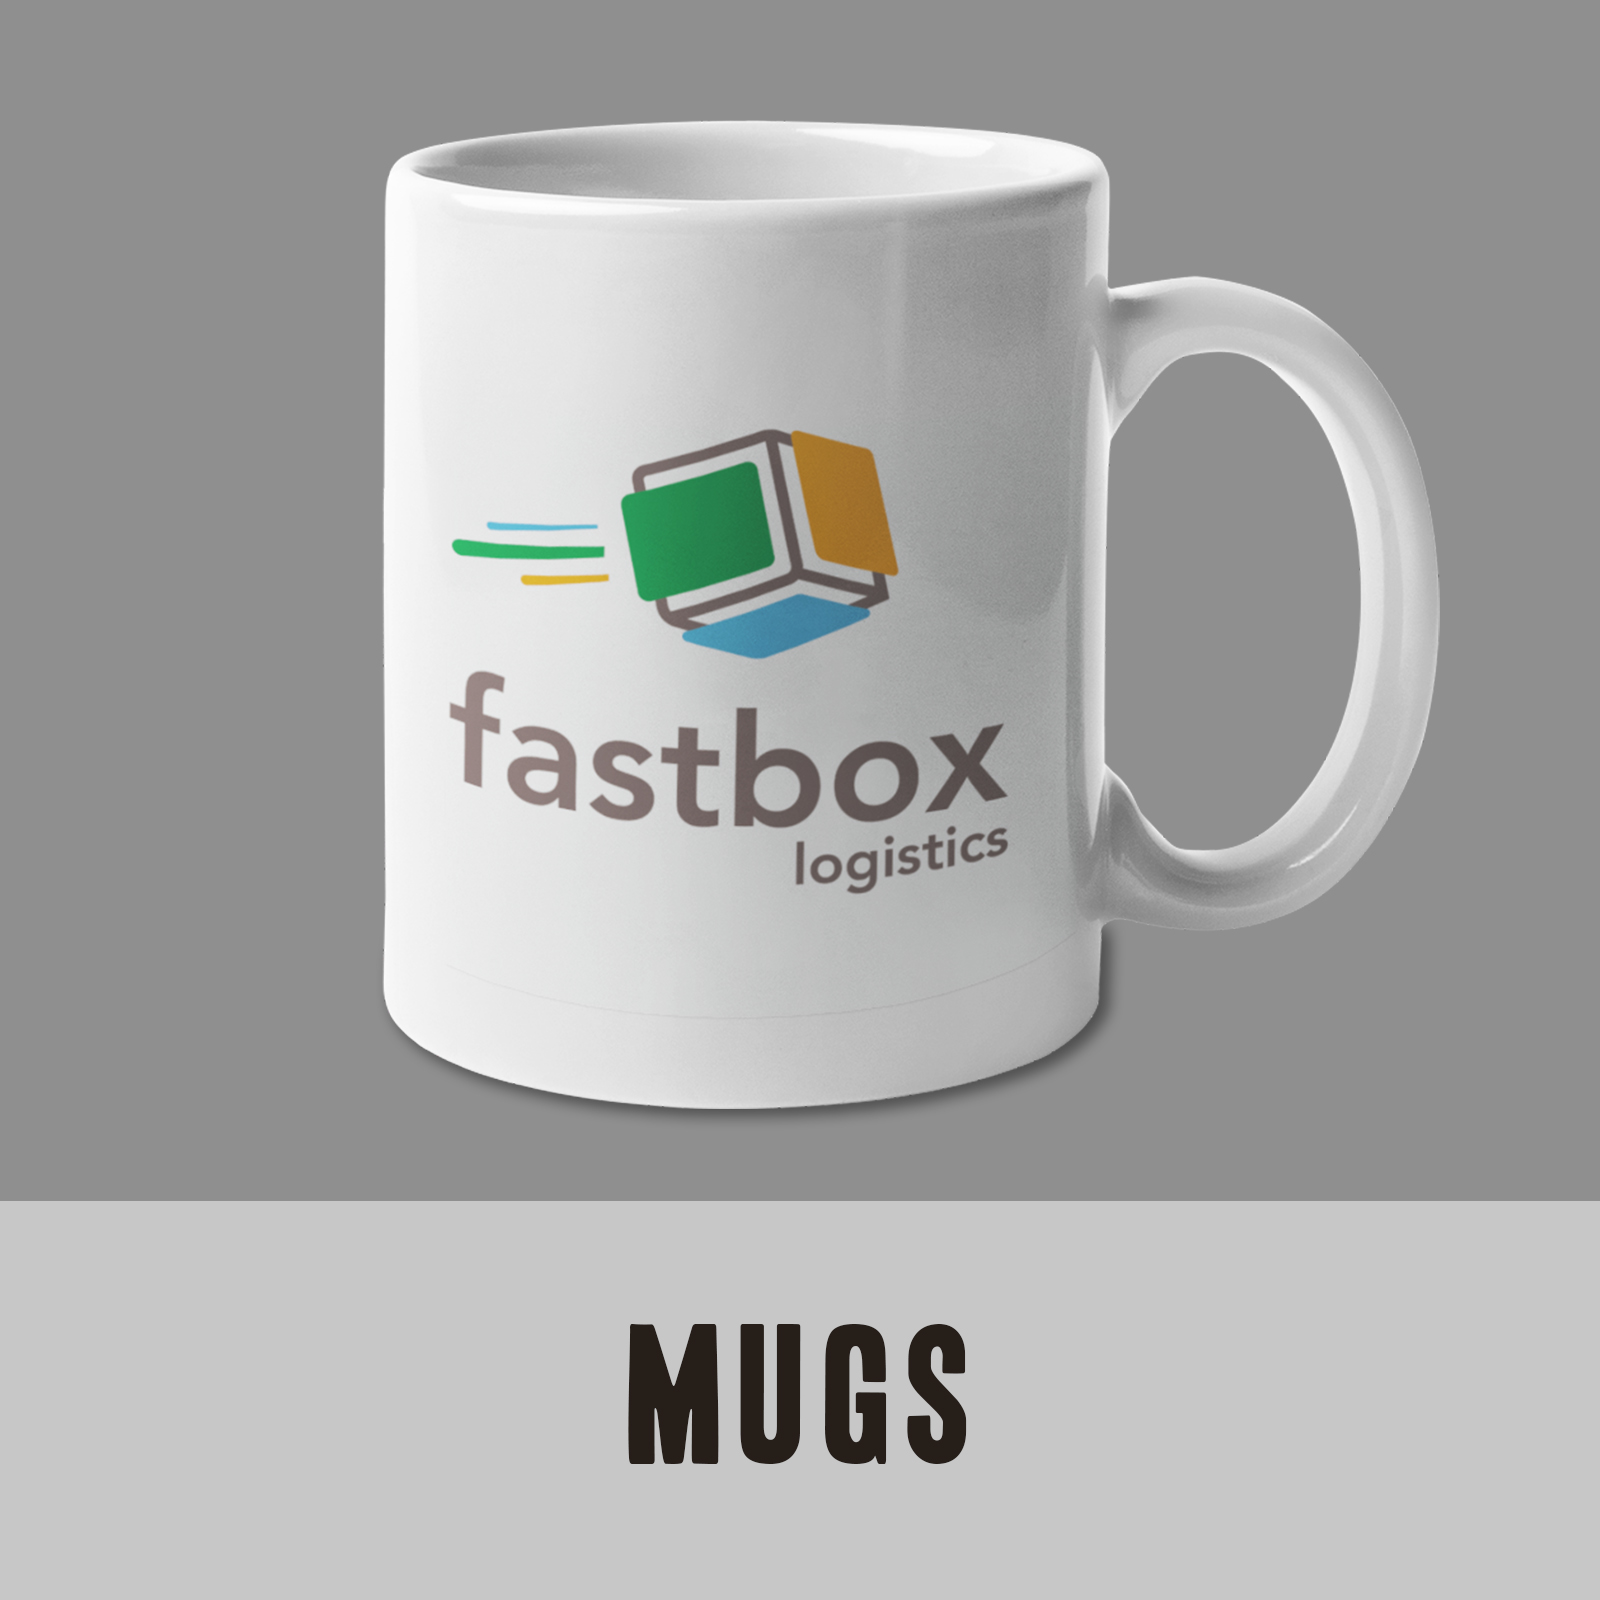 Mugs - Fastbox logistics mug